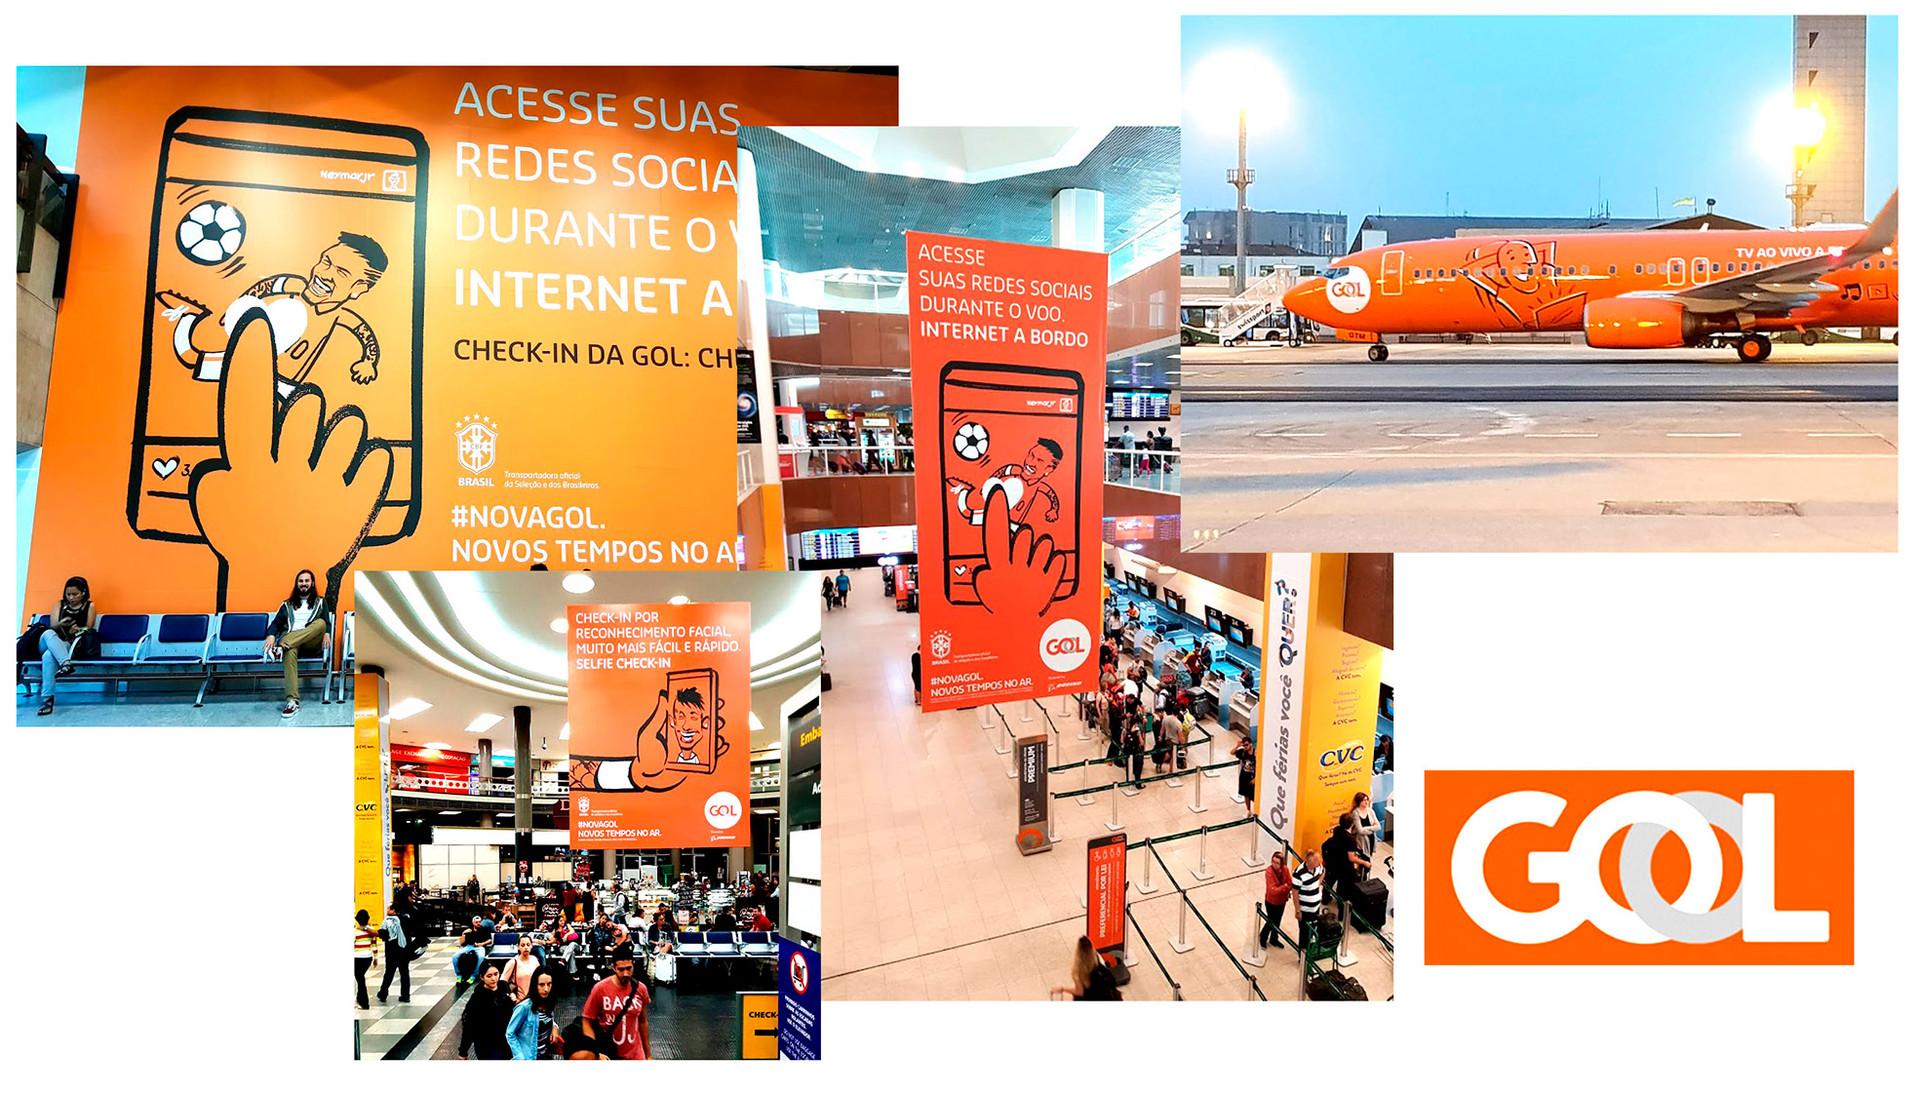 gol-neymar-aeroporto.jpg